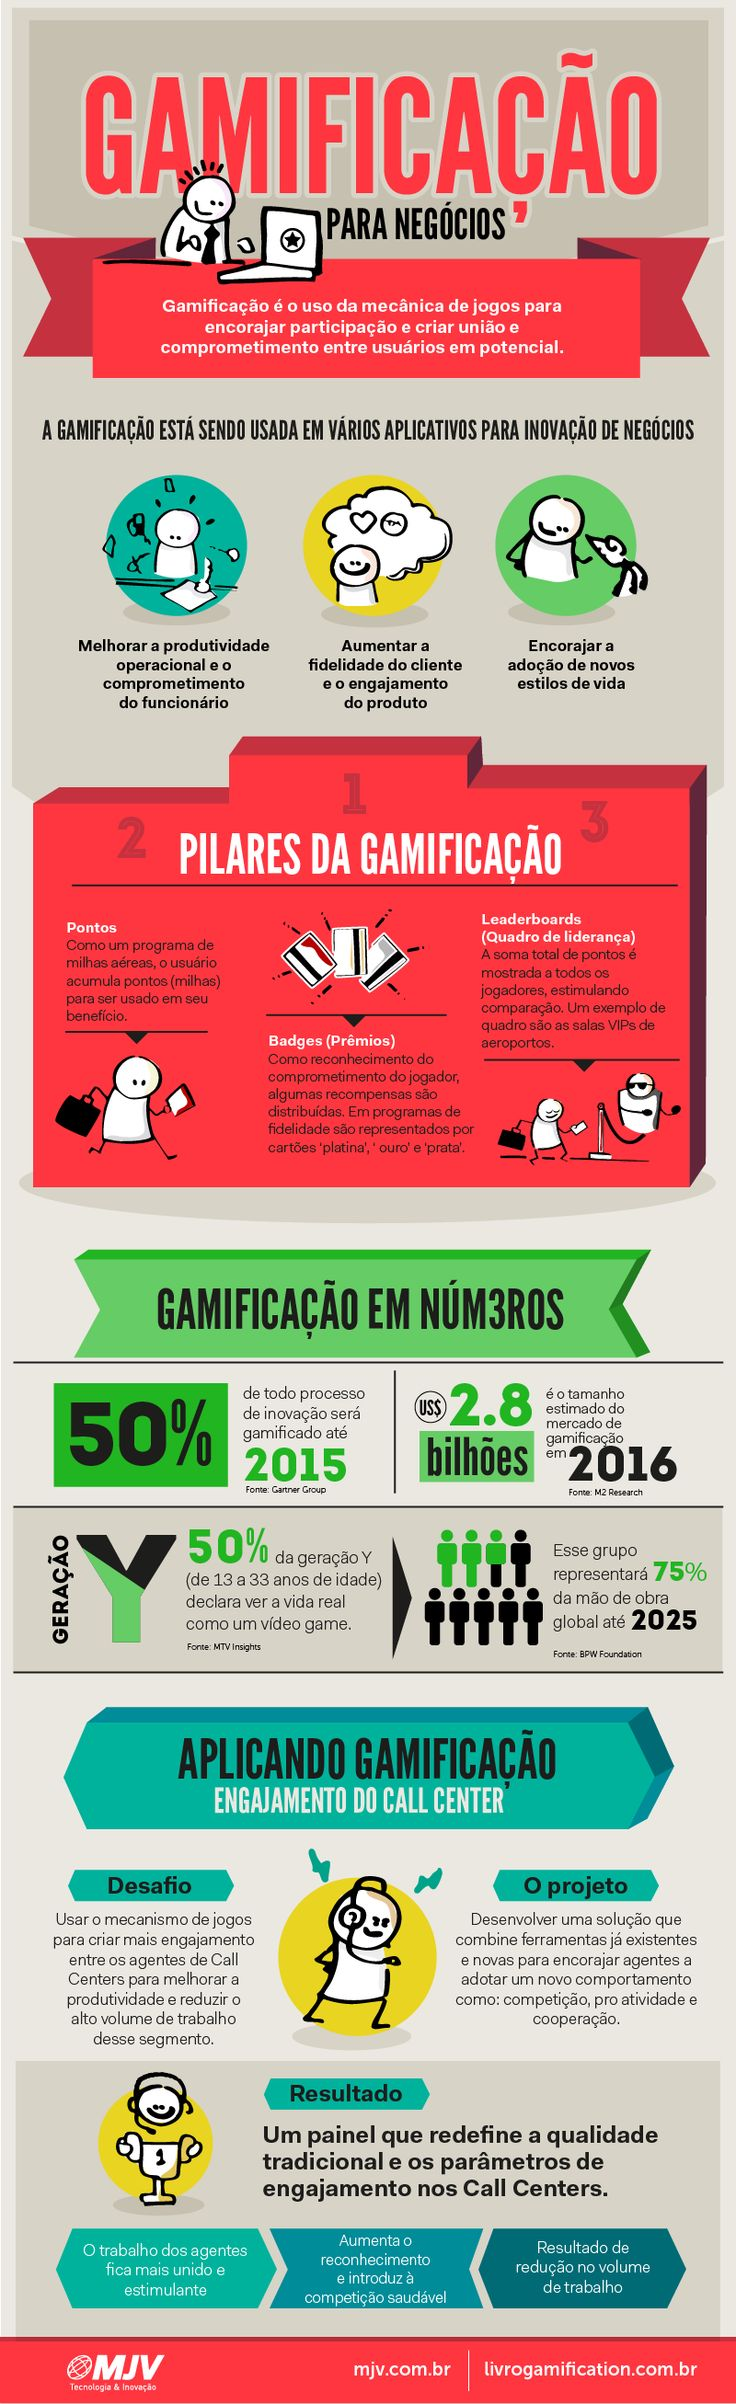 infografico_gamification_negocios_MJV_portugues-01